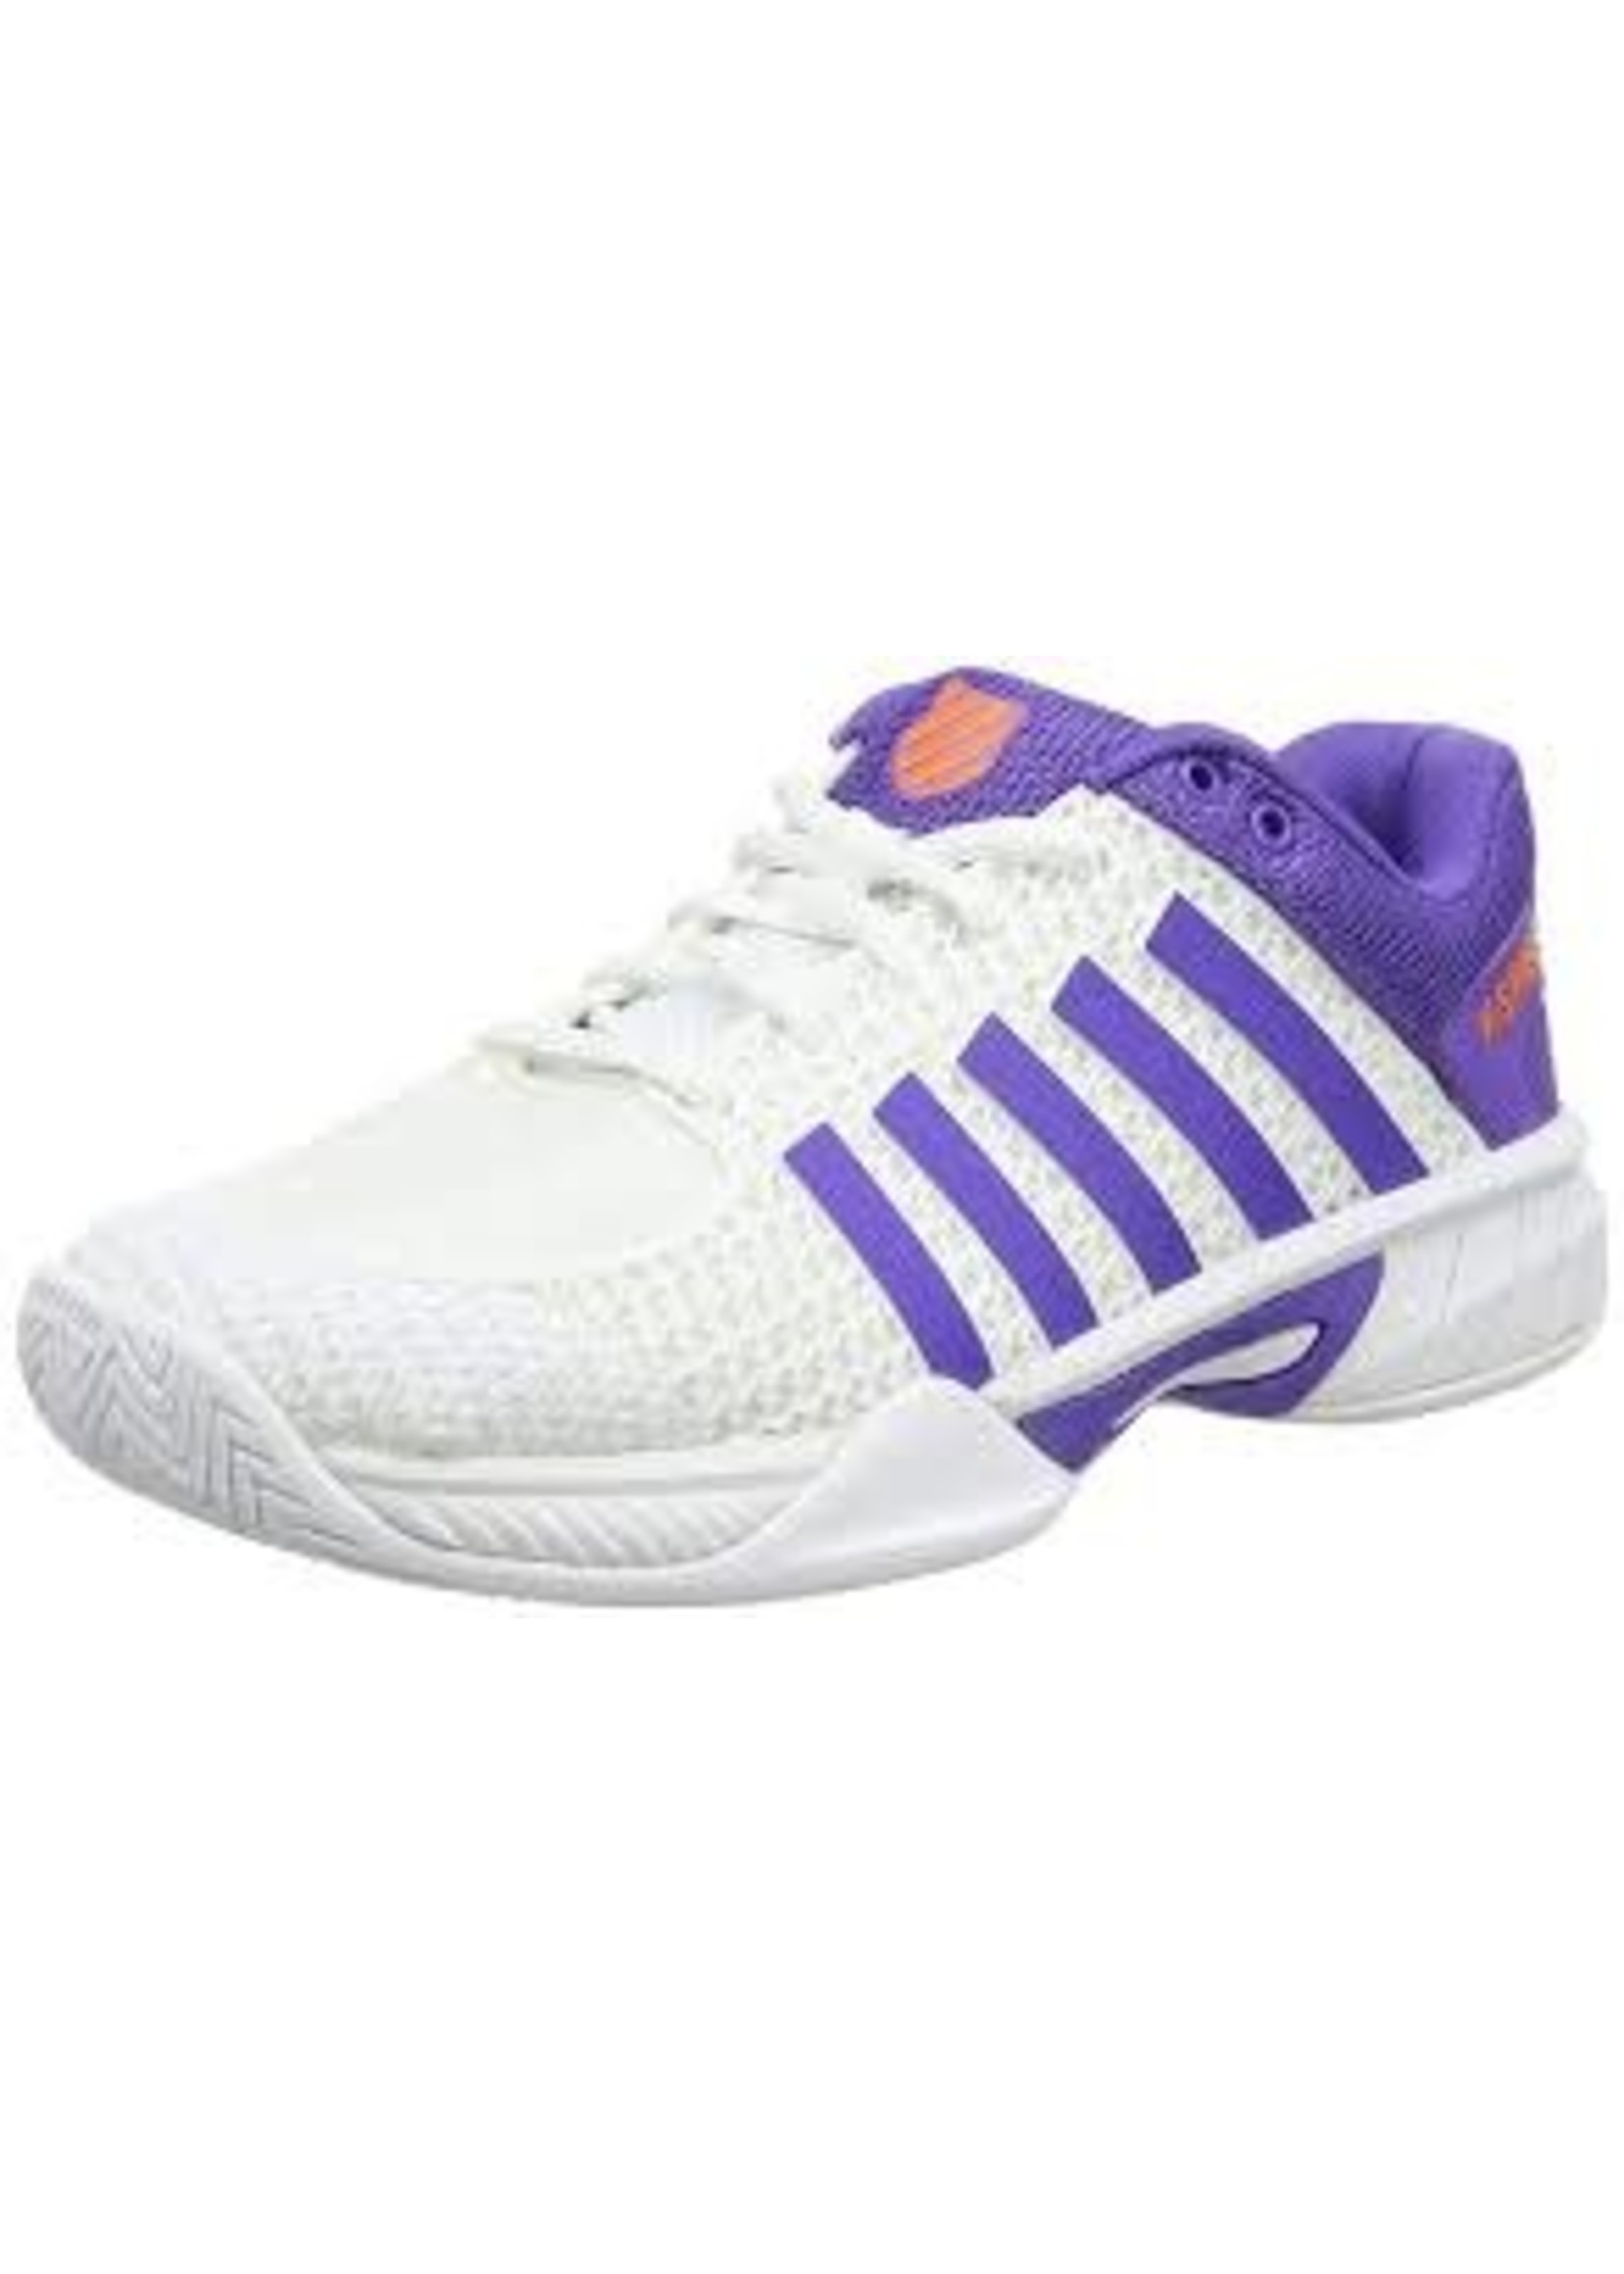 K Swiss K-Swiss Express Light Ladies Tennis Shoes (2017) White/Purple 7.5